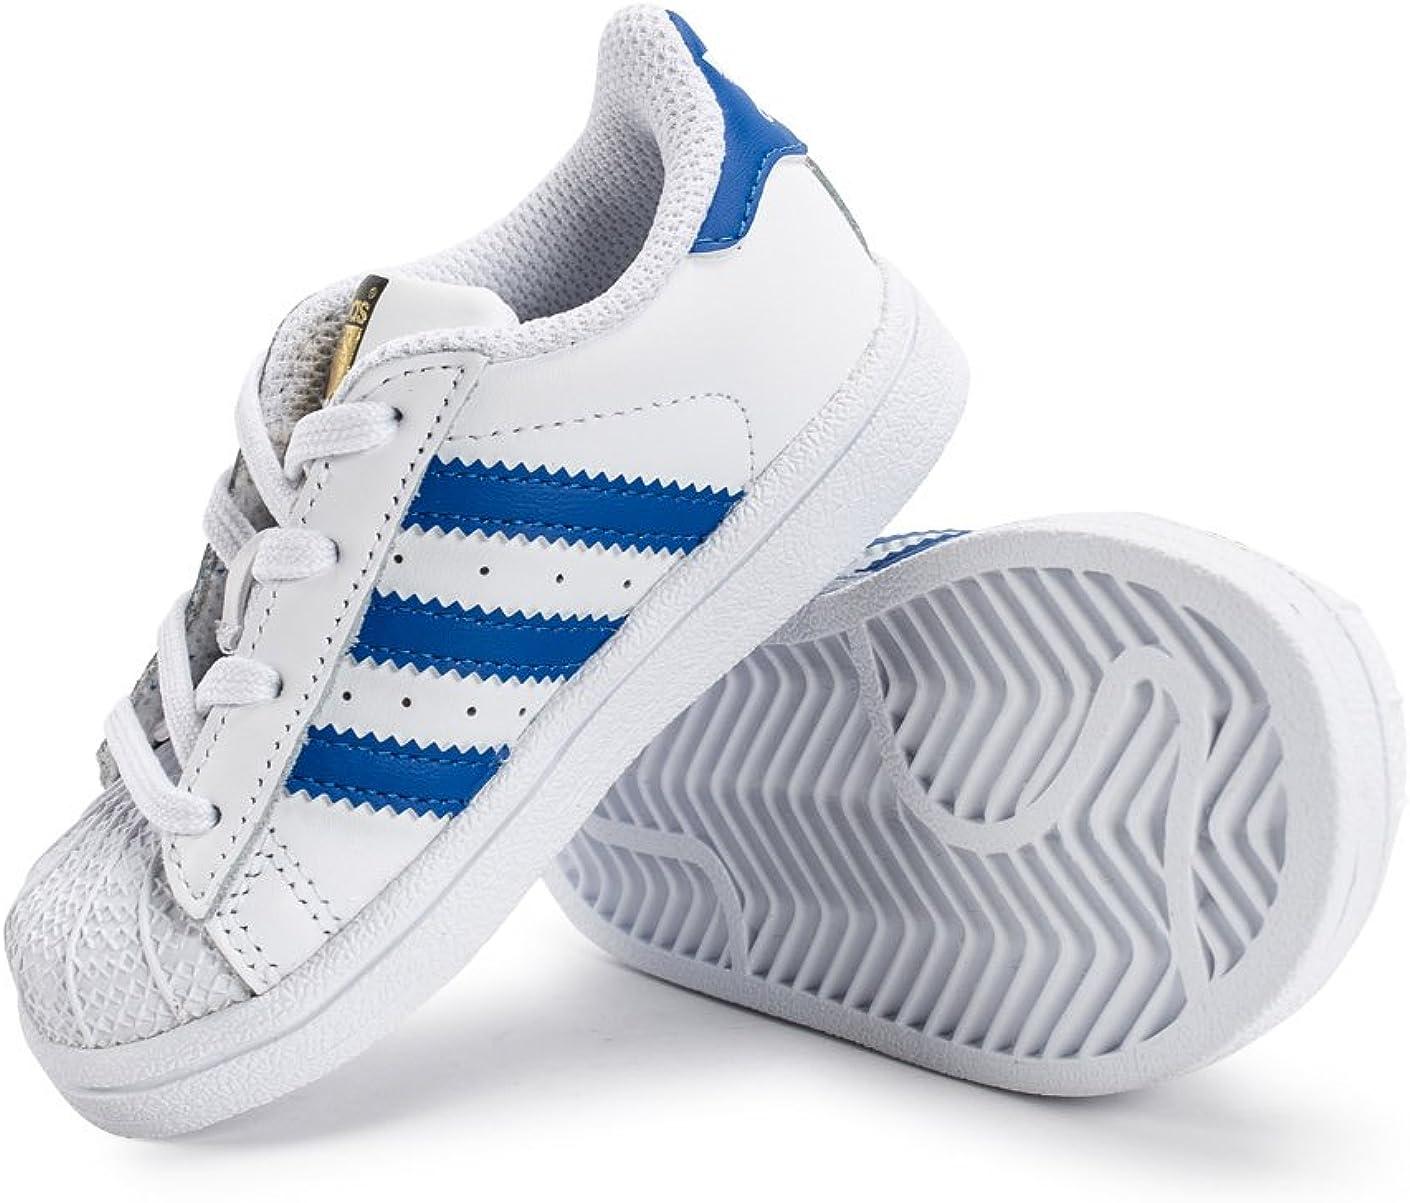 adidas Chaussures Superstar I Blanc/Bleu/Blanc : Amazon.fr ...